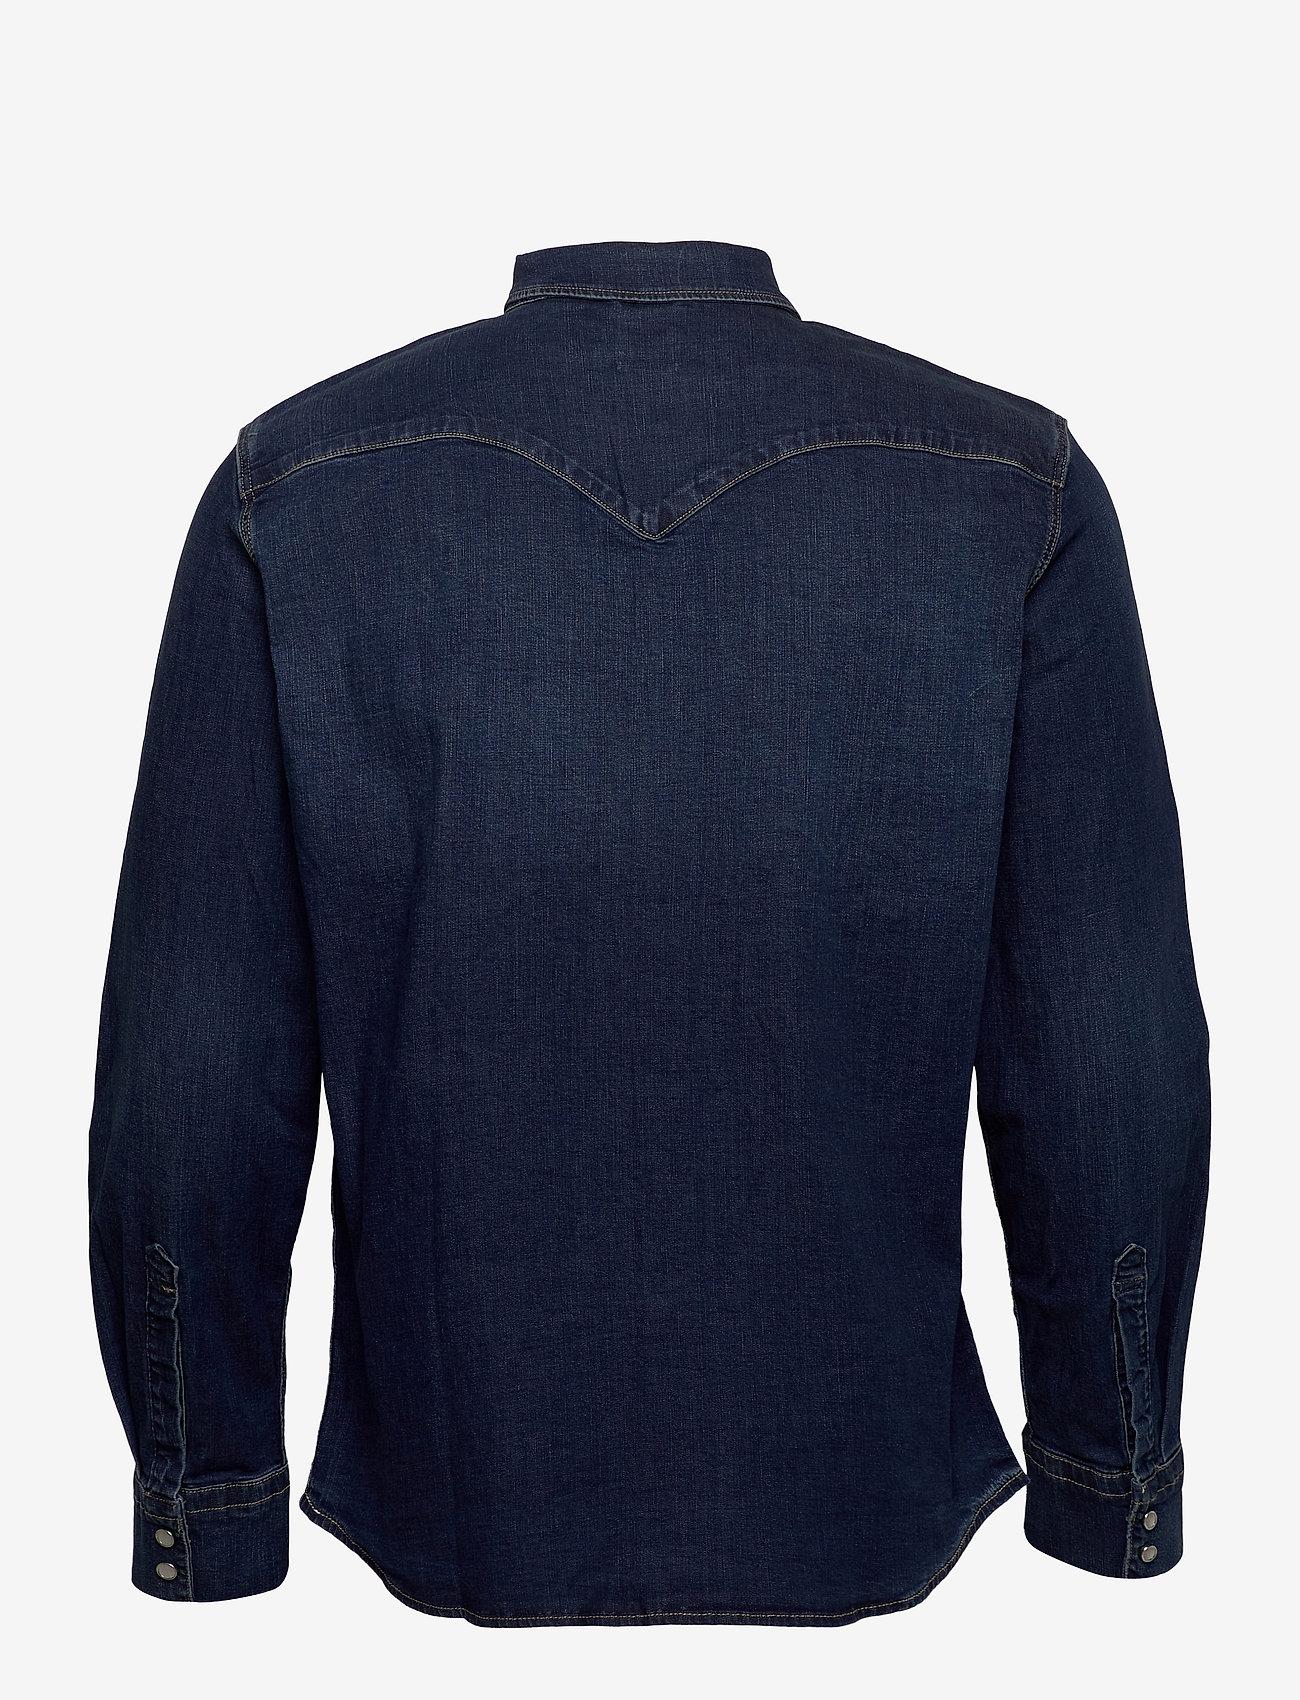 LEVI´S Men - BARSTOW WESTERN STANDARD MODER - koszule w kratkę - blues - 1